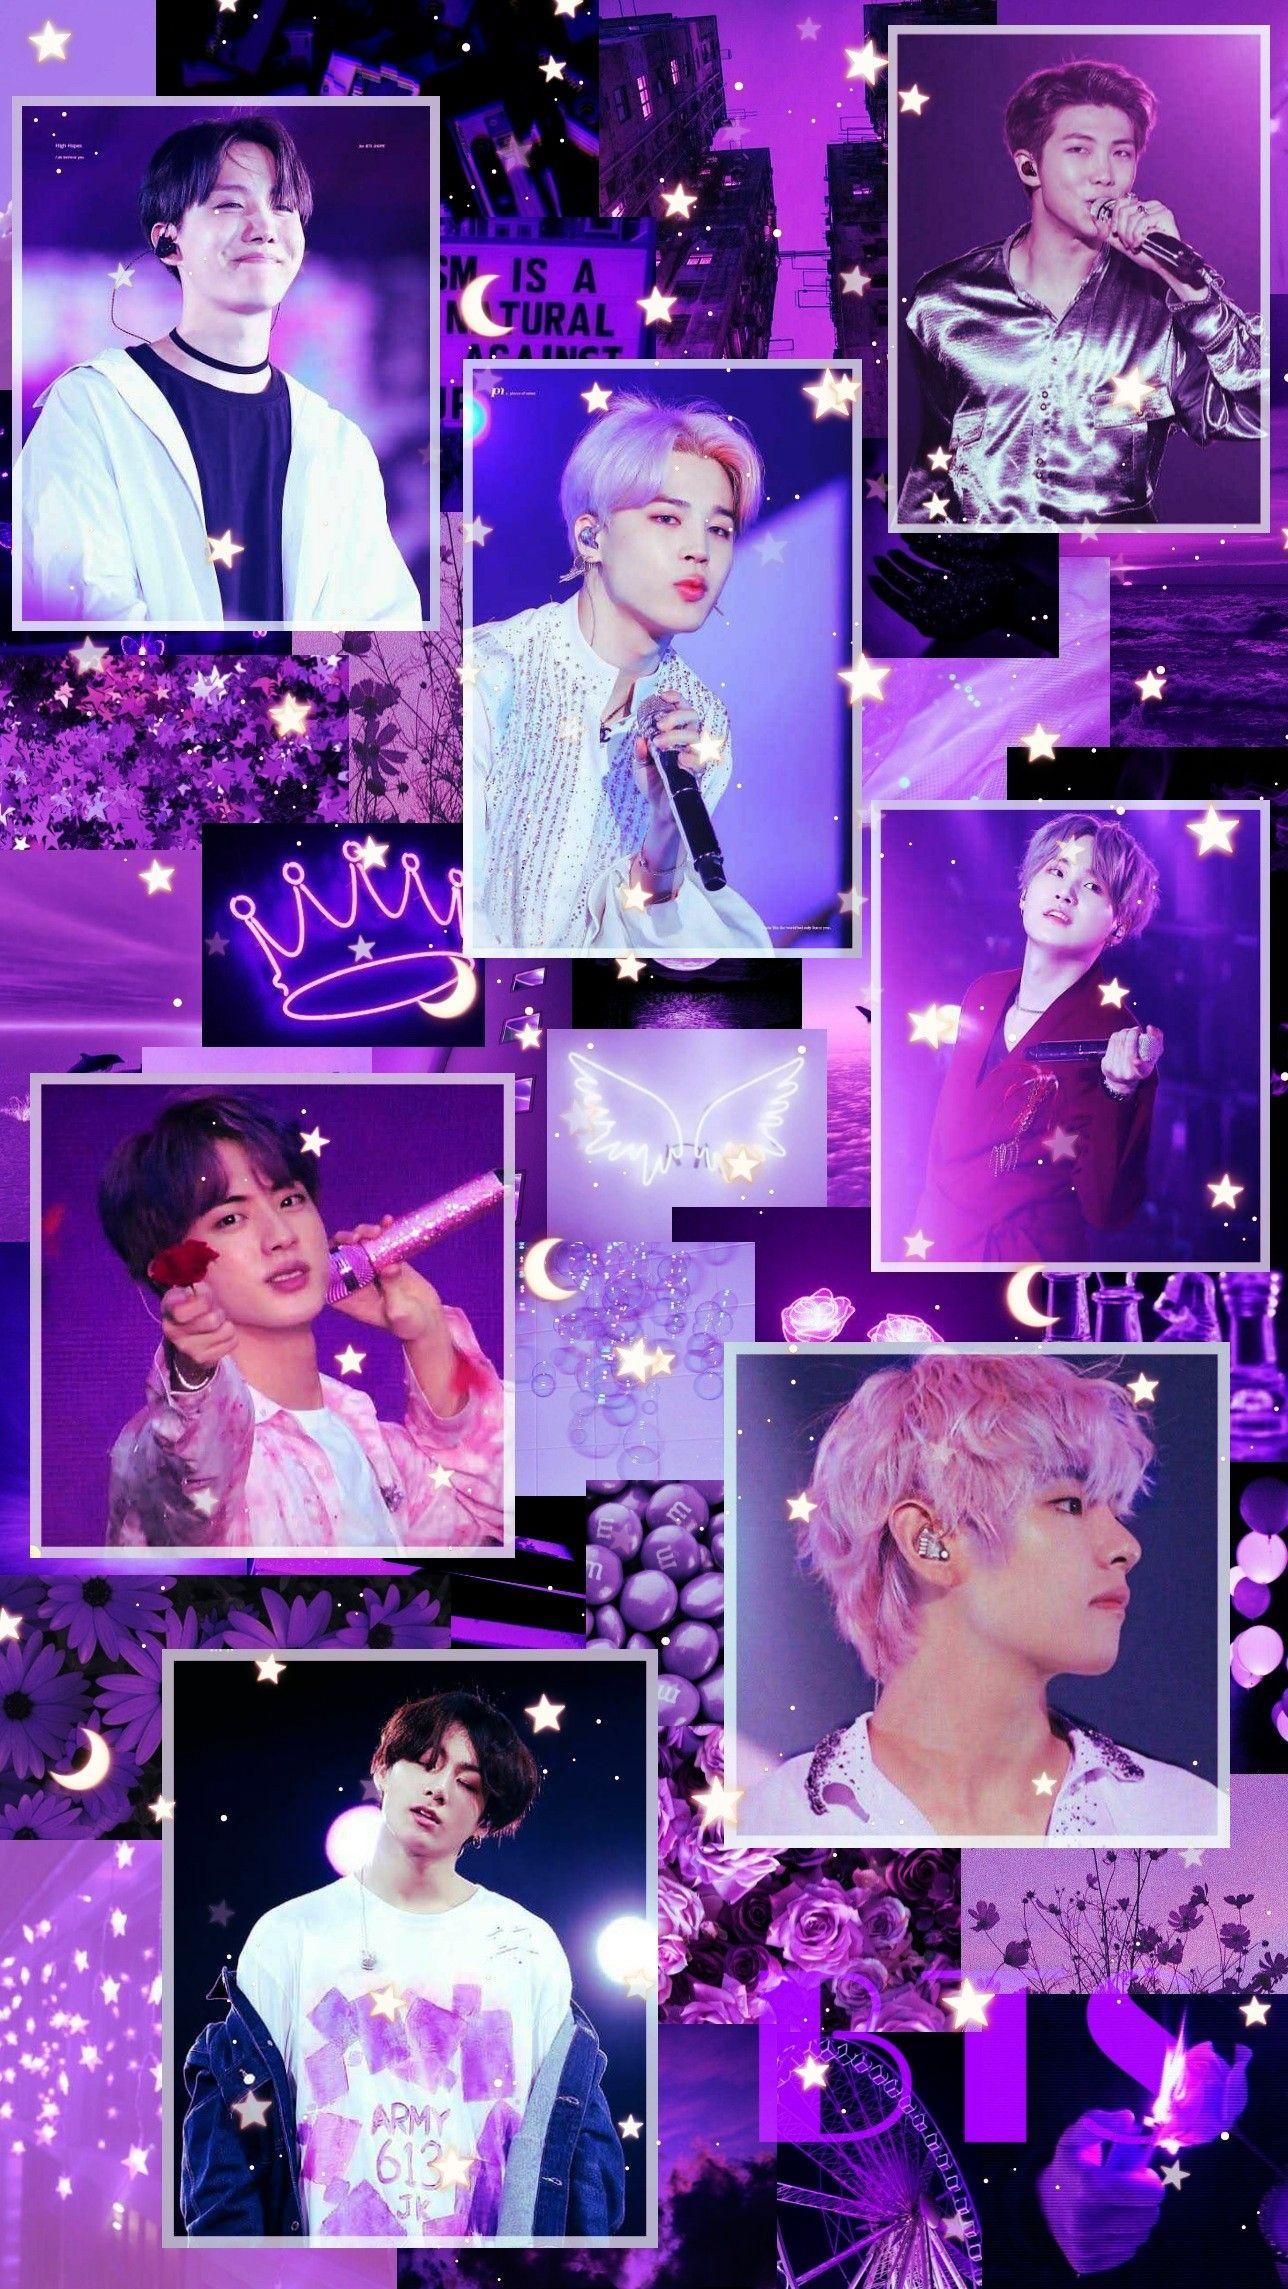 Pin By Karla On Bts Wallpaper Bts Aesthetic Wallpaper For Phone Bts Beautiful Bts Wallpaper Iphone bts purple wallpaper